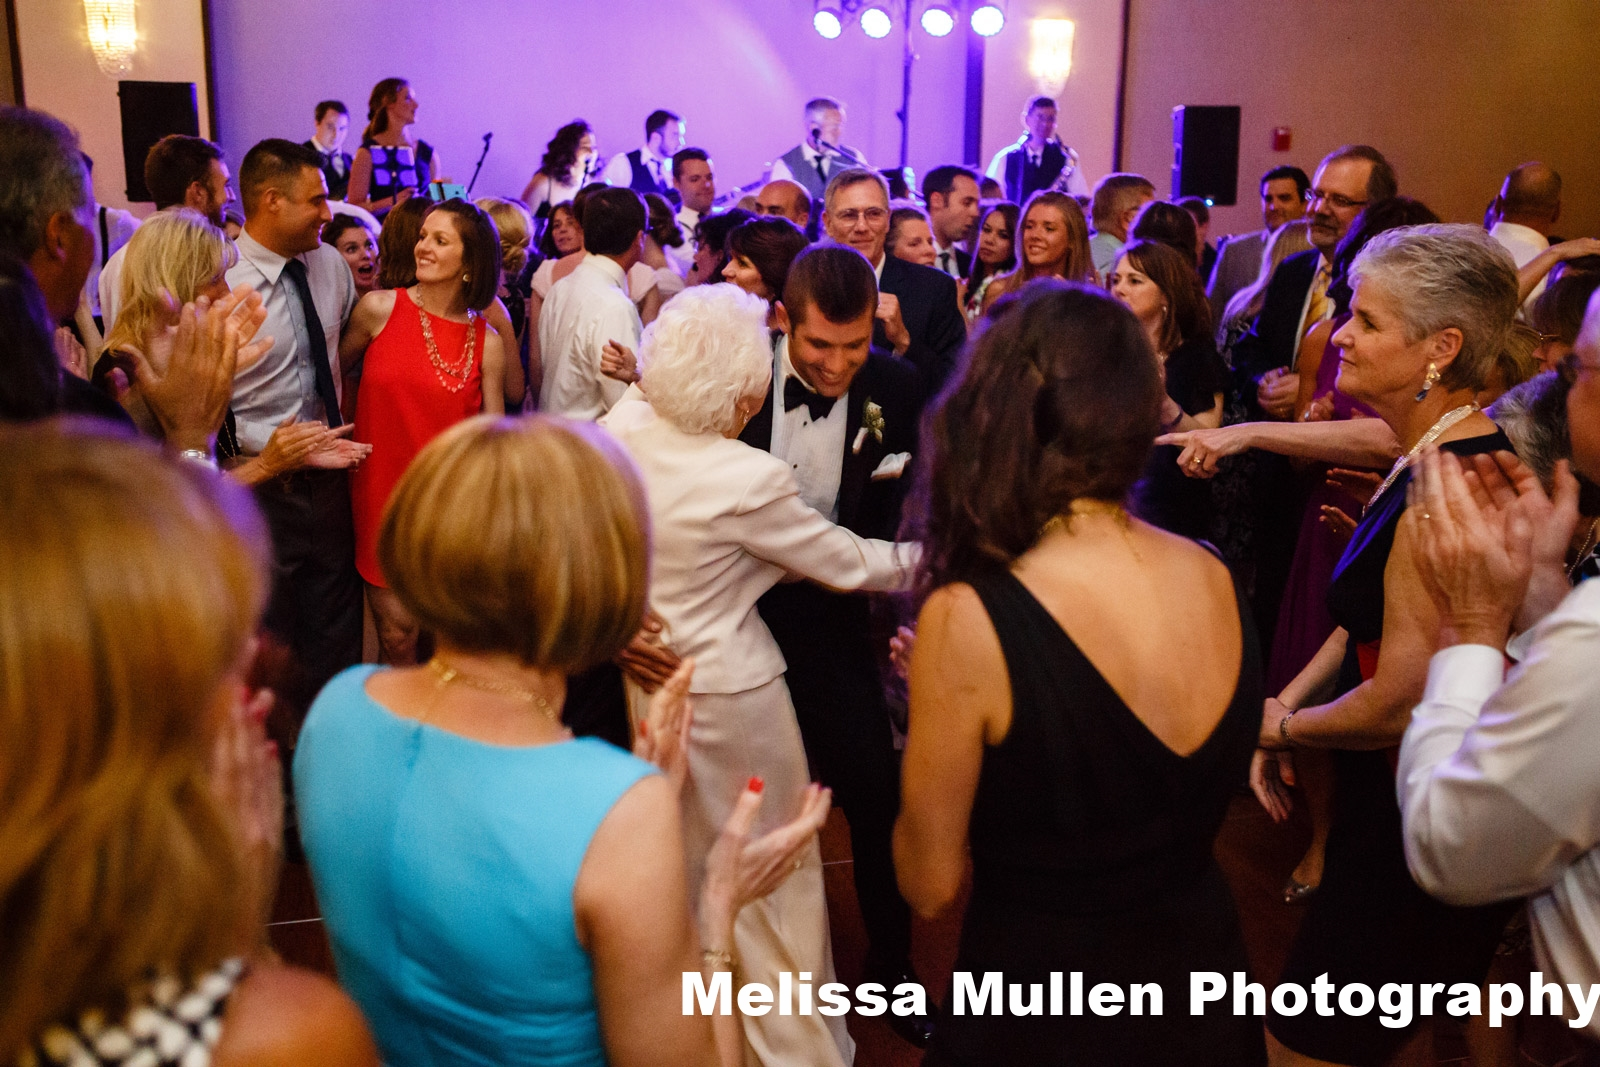 878_Melissa-Mullen-Photography.jpg